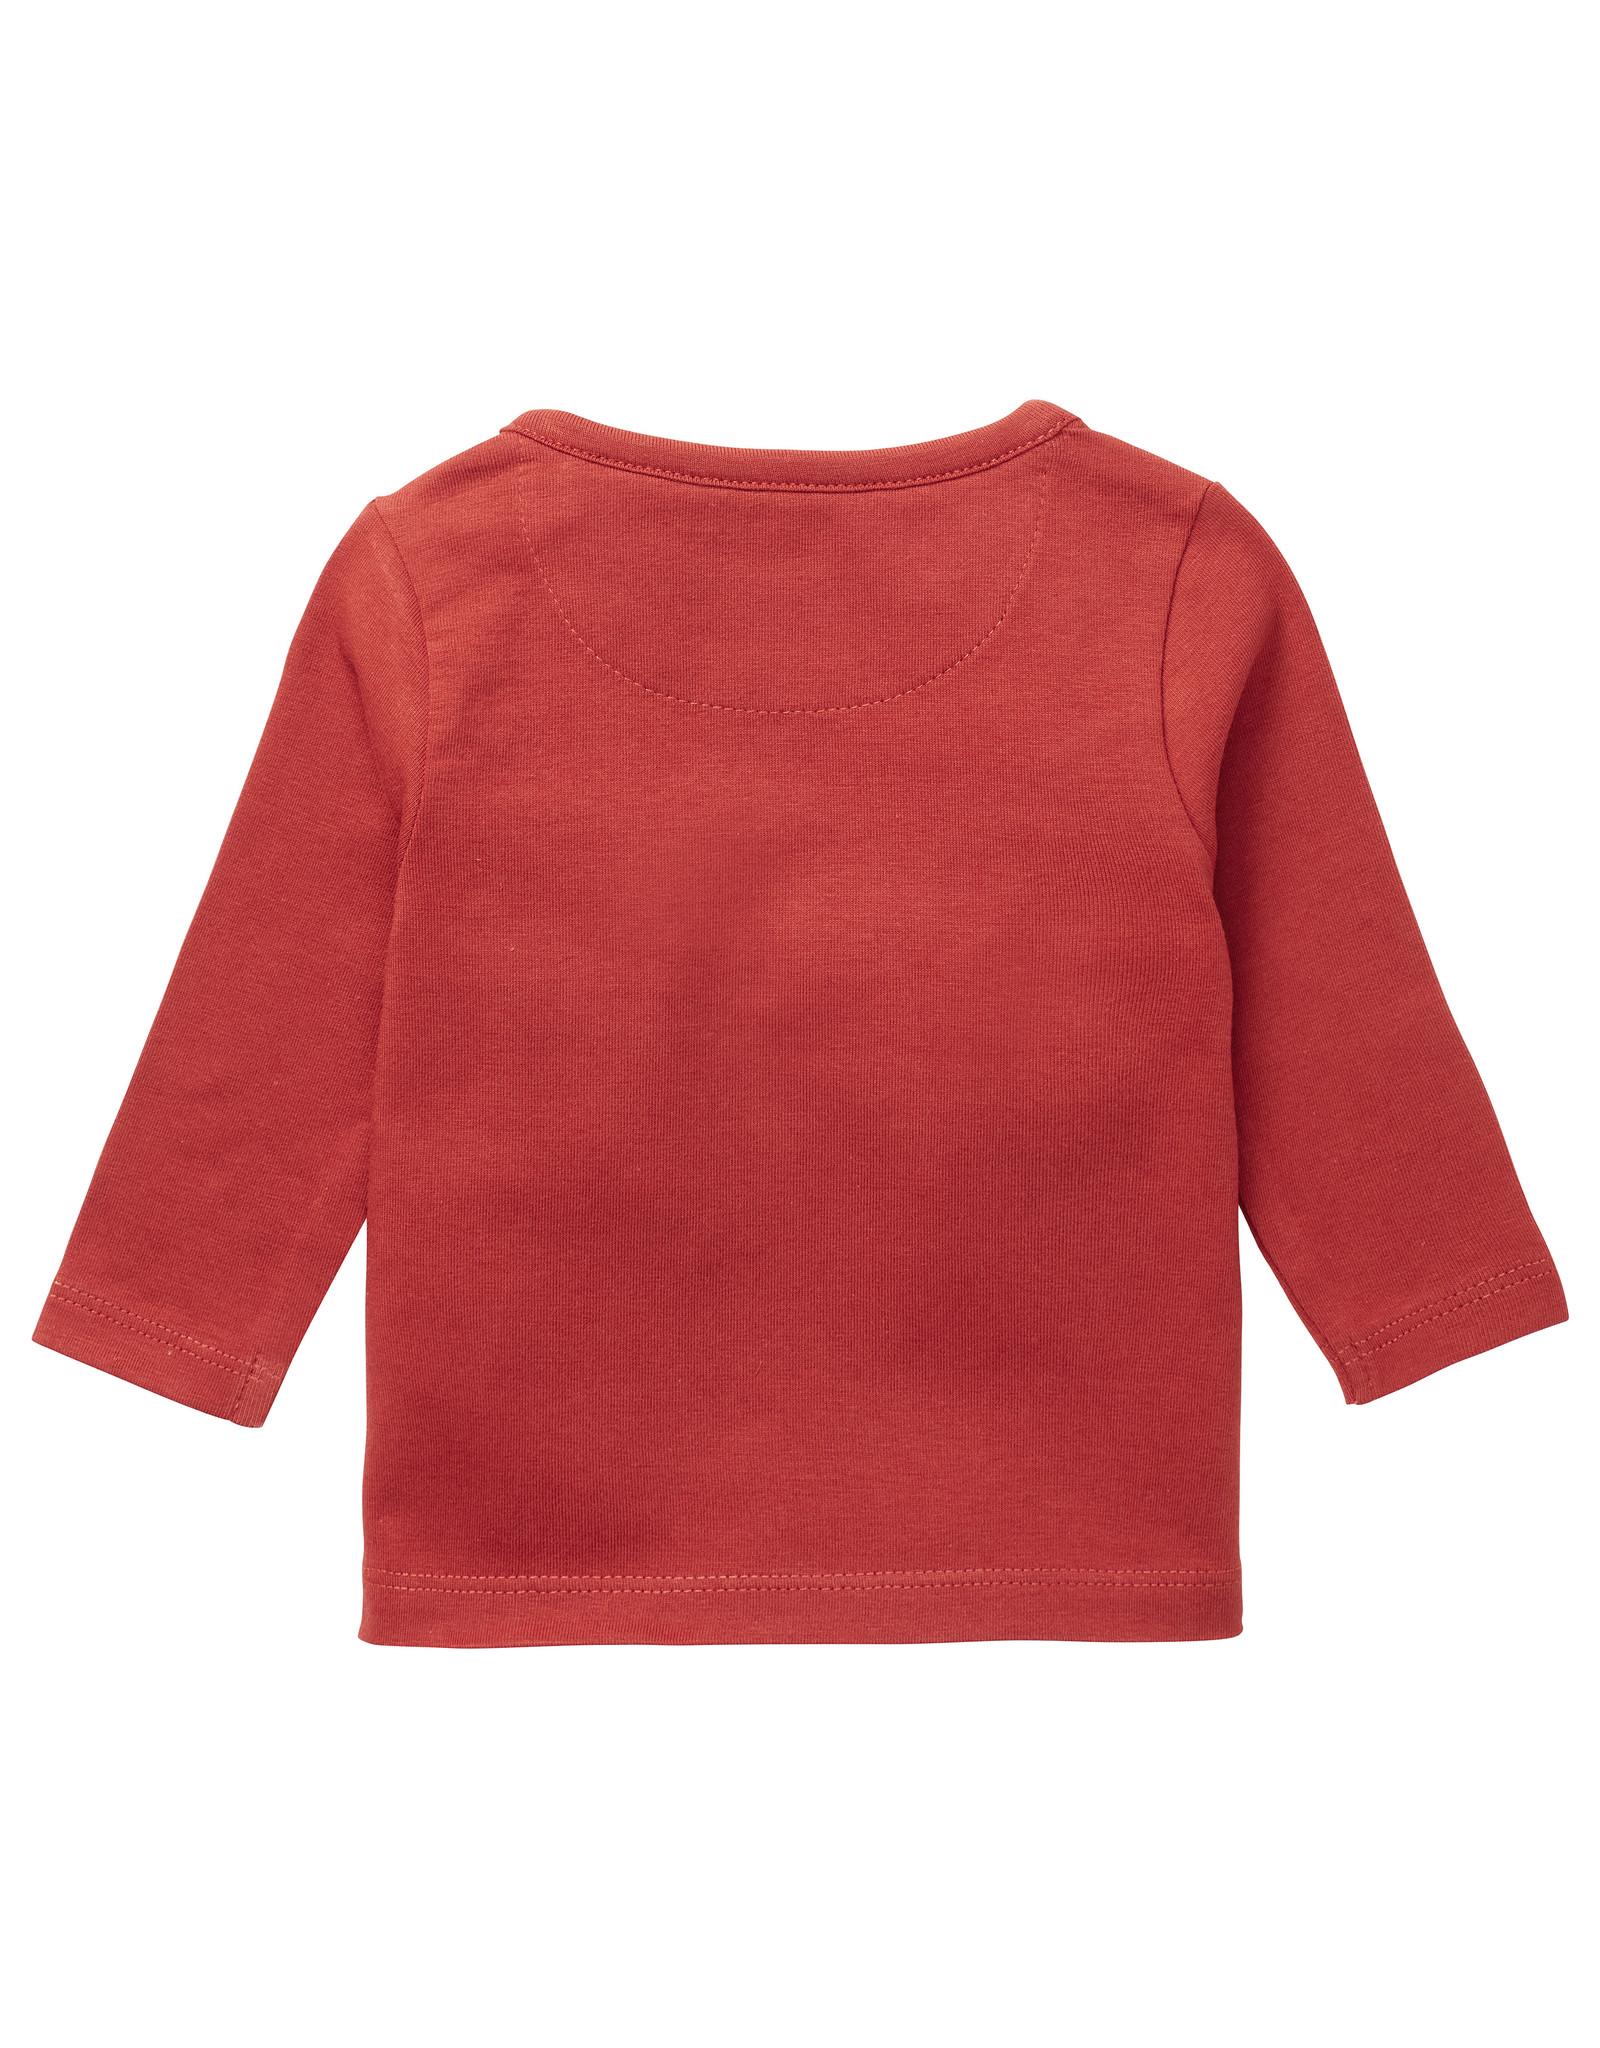 Noppies G T-Shirt LS Macey, Bossa Nova